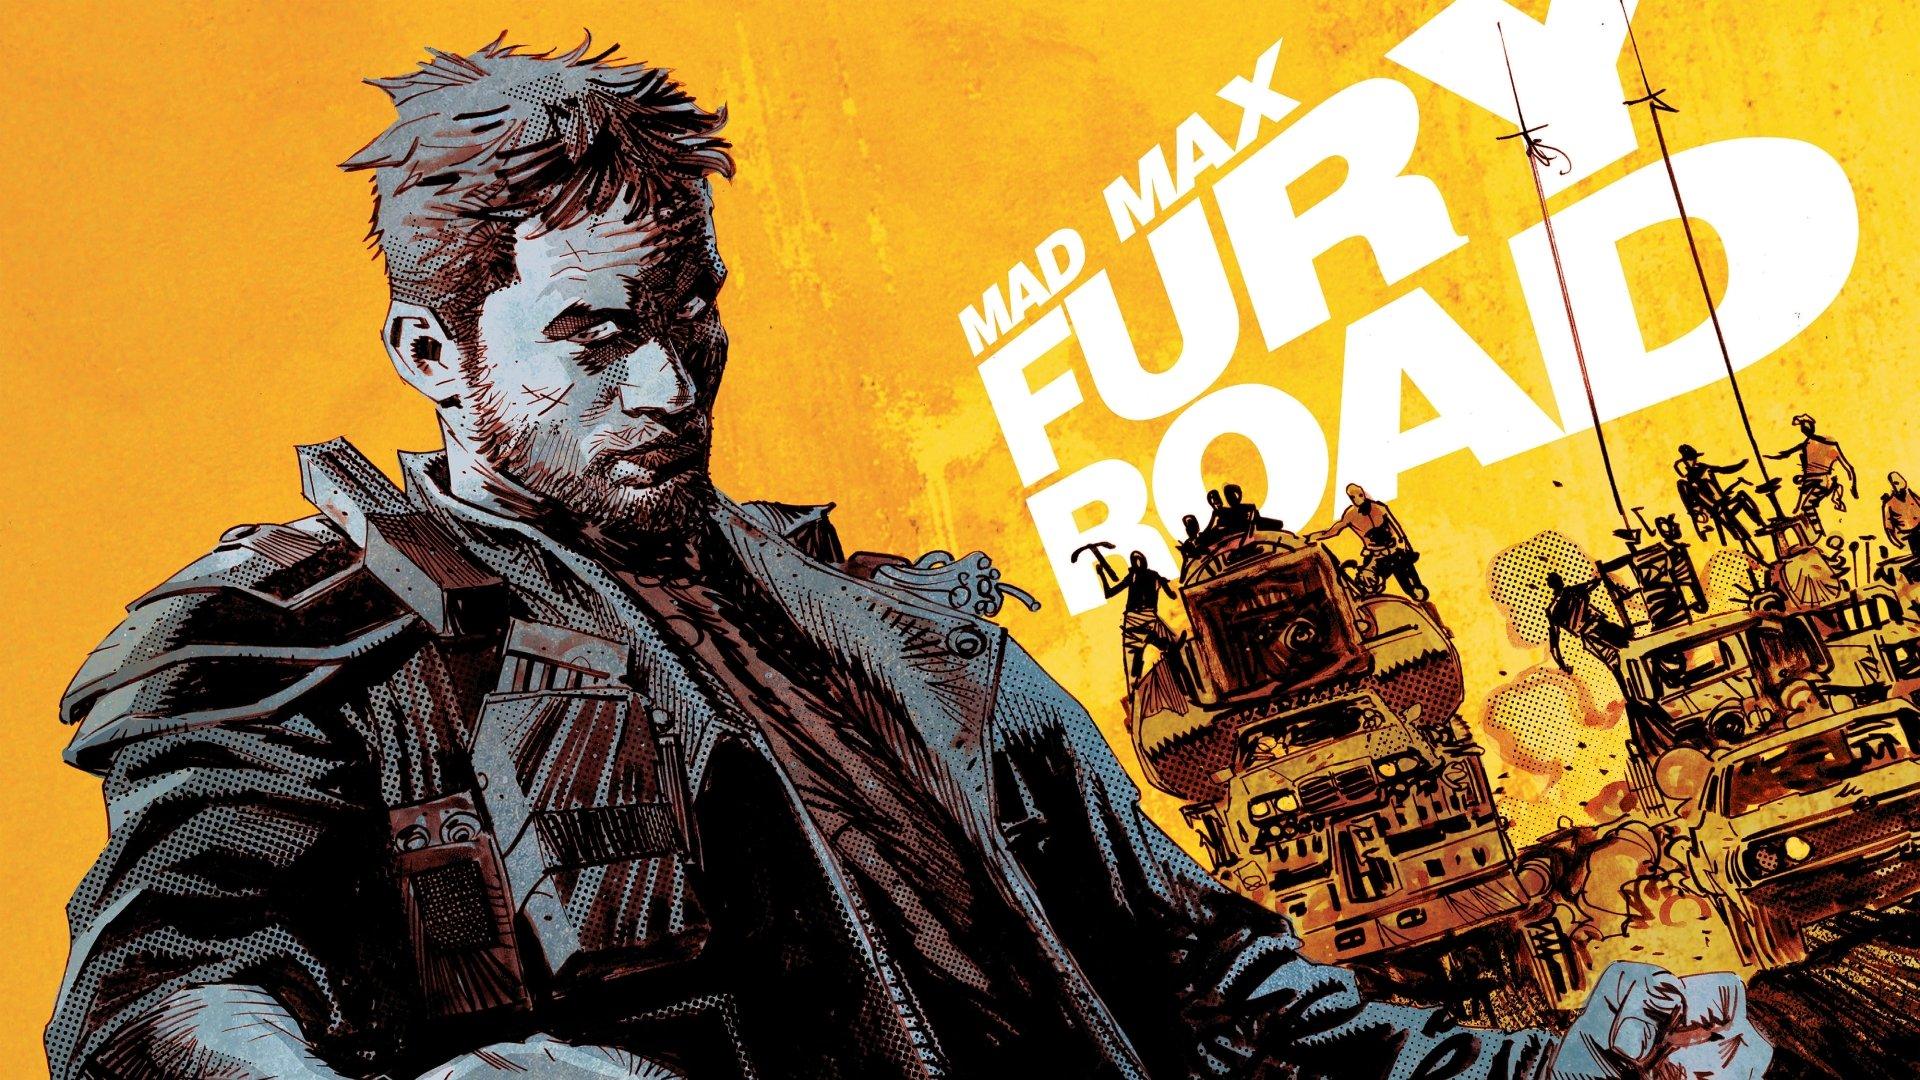 Mad Max: Fury Road 4k Ultra HD Wallpaper | Background ...